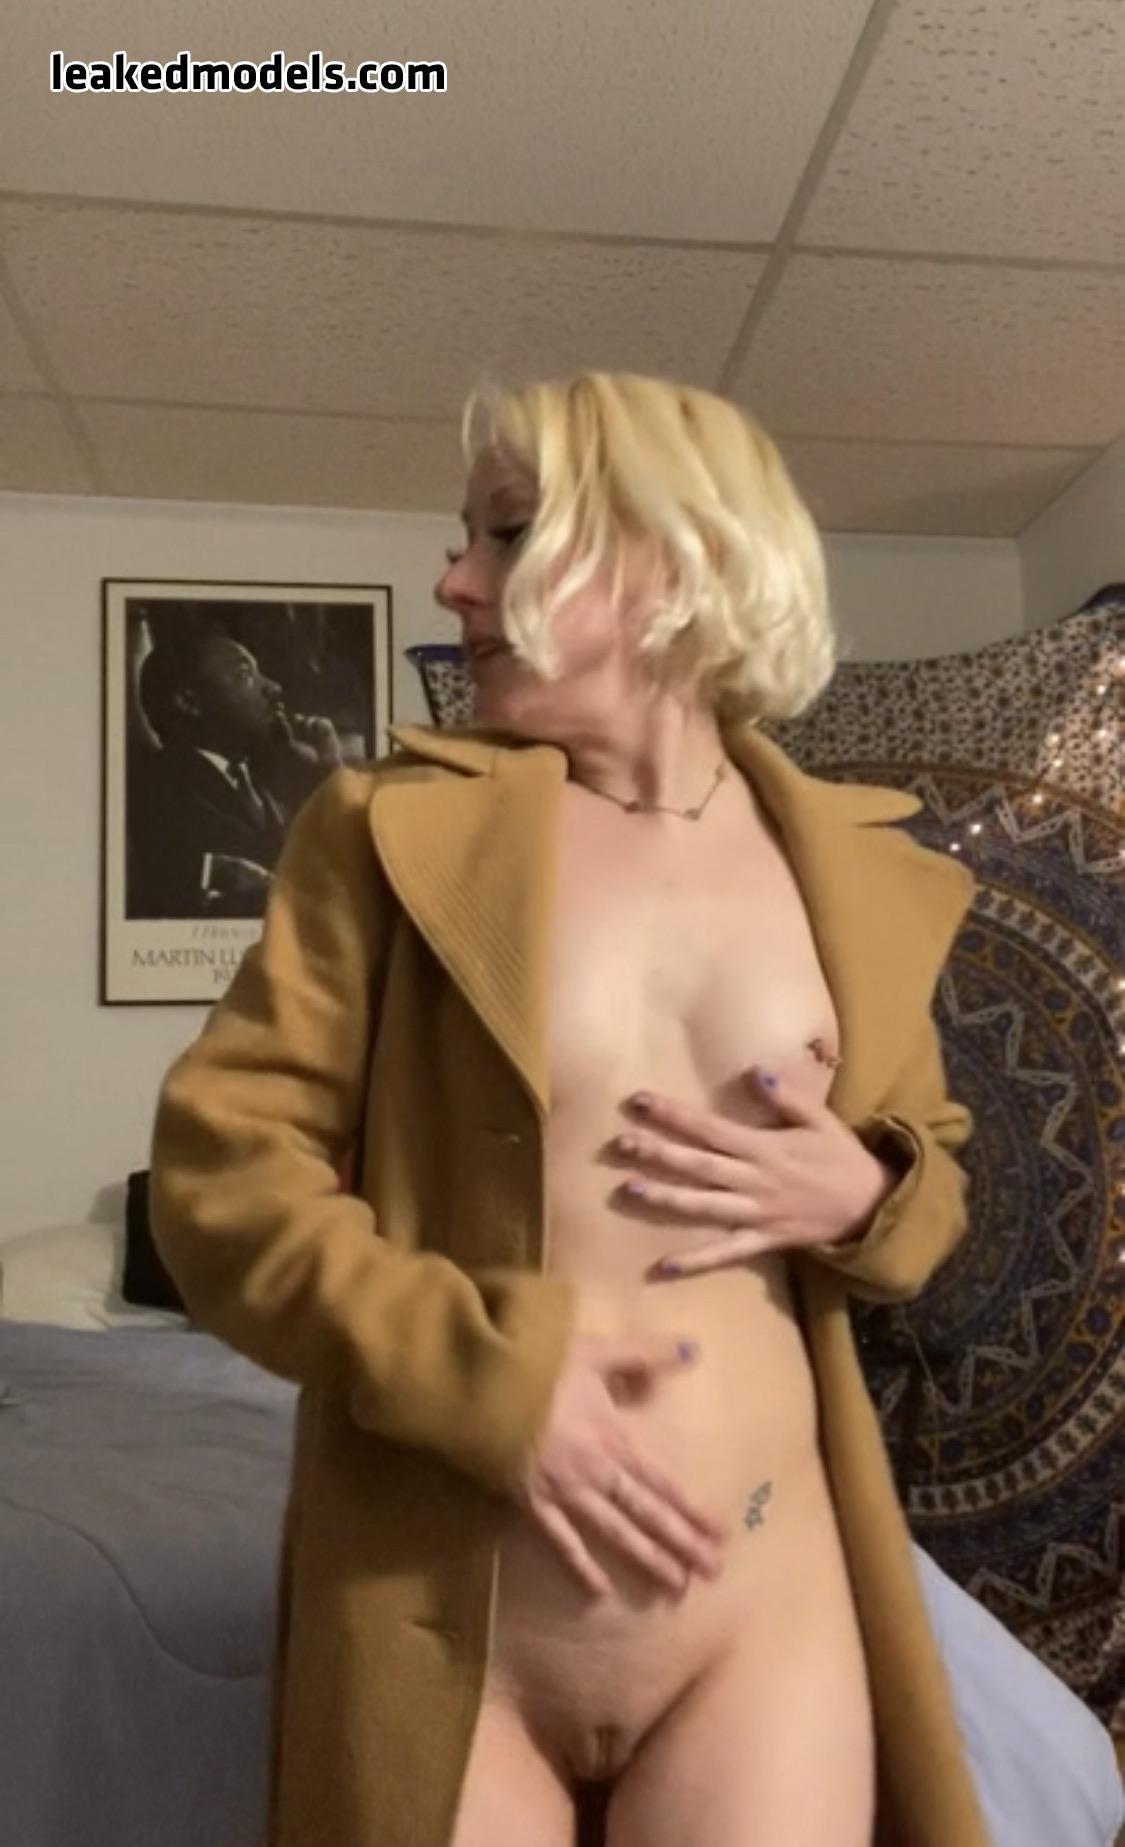 jessa furches   realjessalovesmj leaked nude leakedmodels.com 0005 - Jessa Furches – realjessalovesmj OnlyFans Nude Leaks (30 Photos)